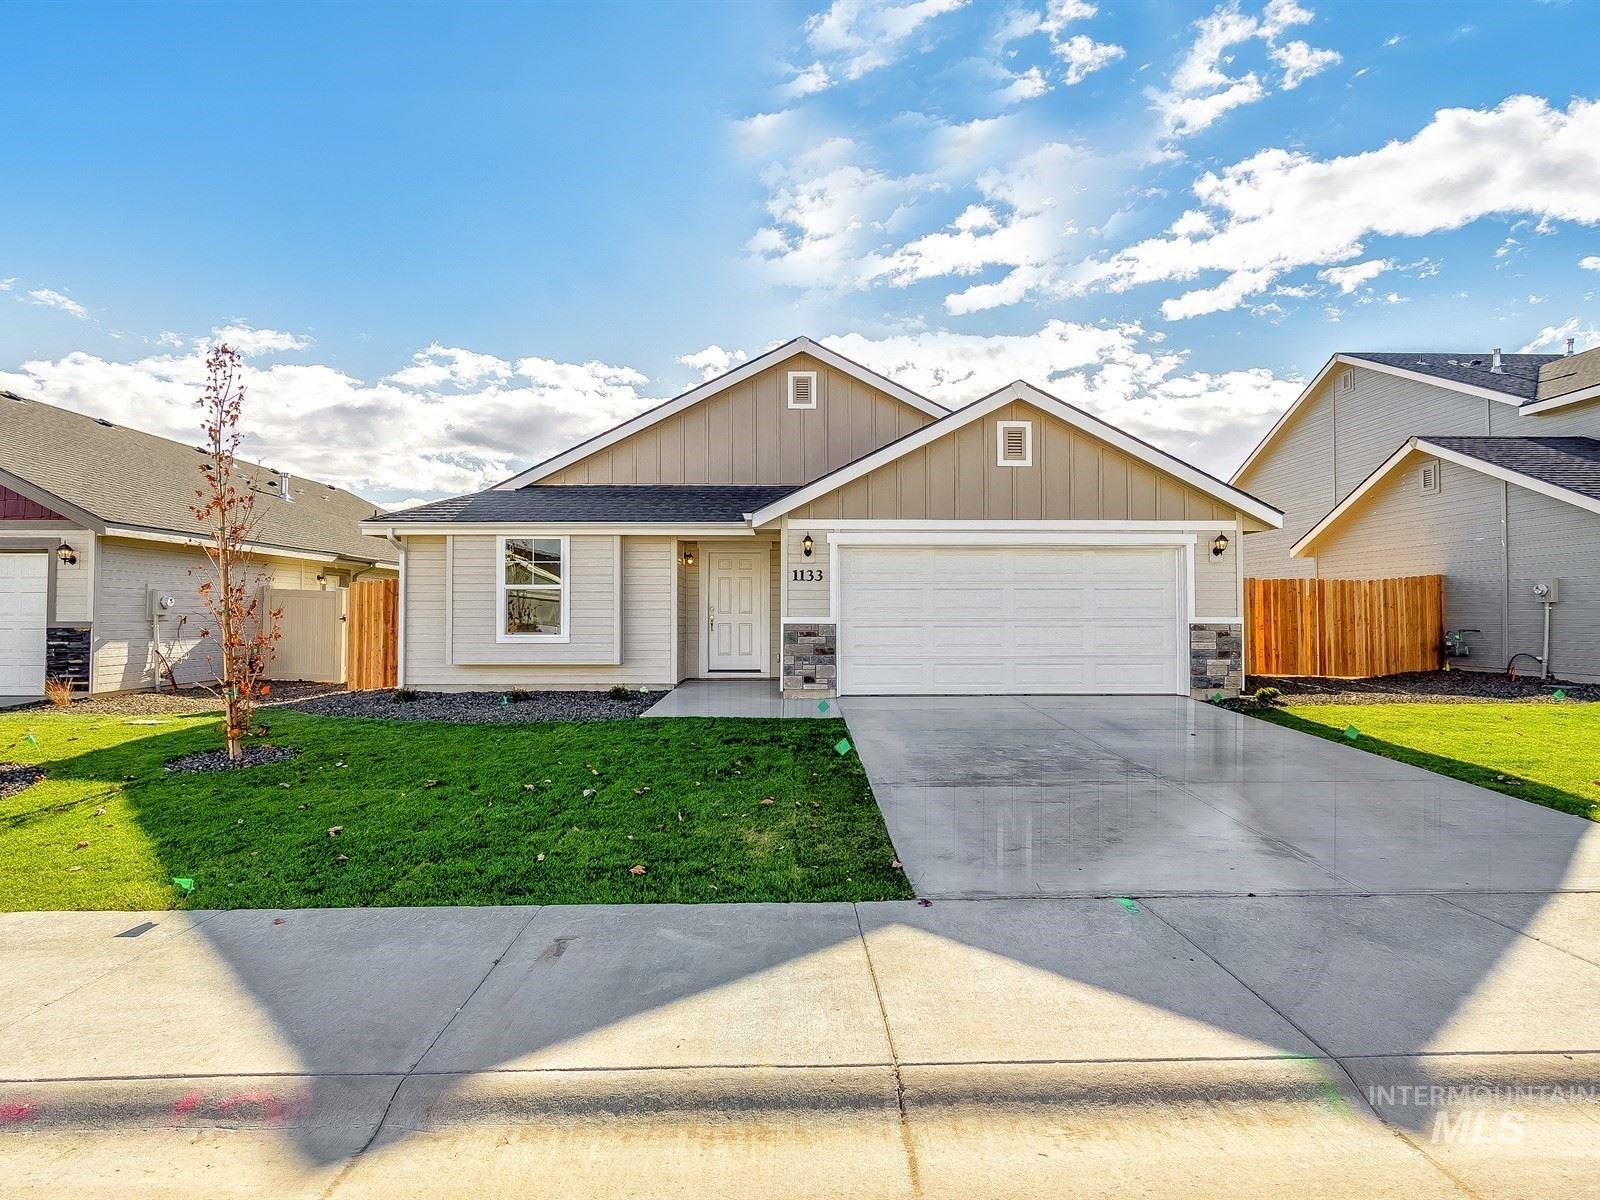 16976 N Tuscarora Way Property Photo - Nampa, ID real estate listing